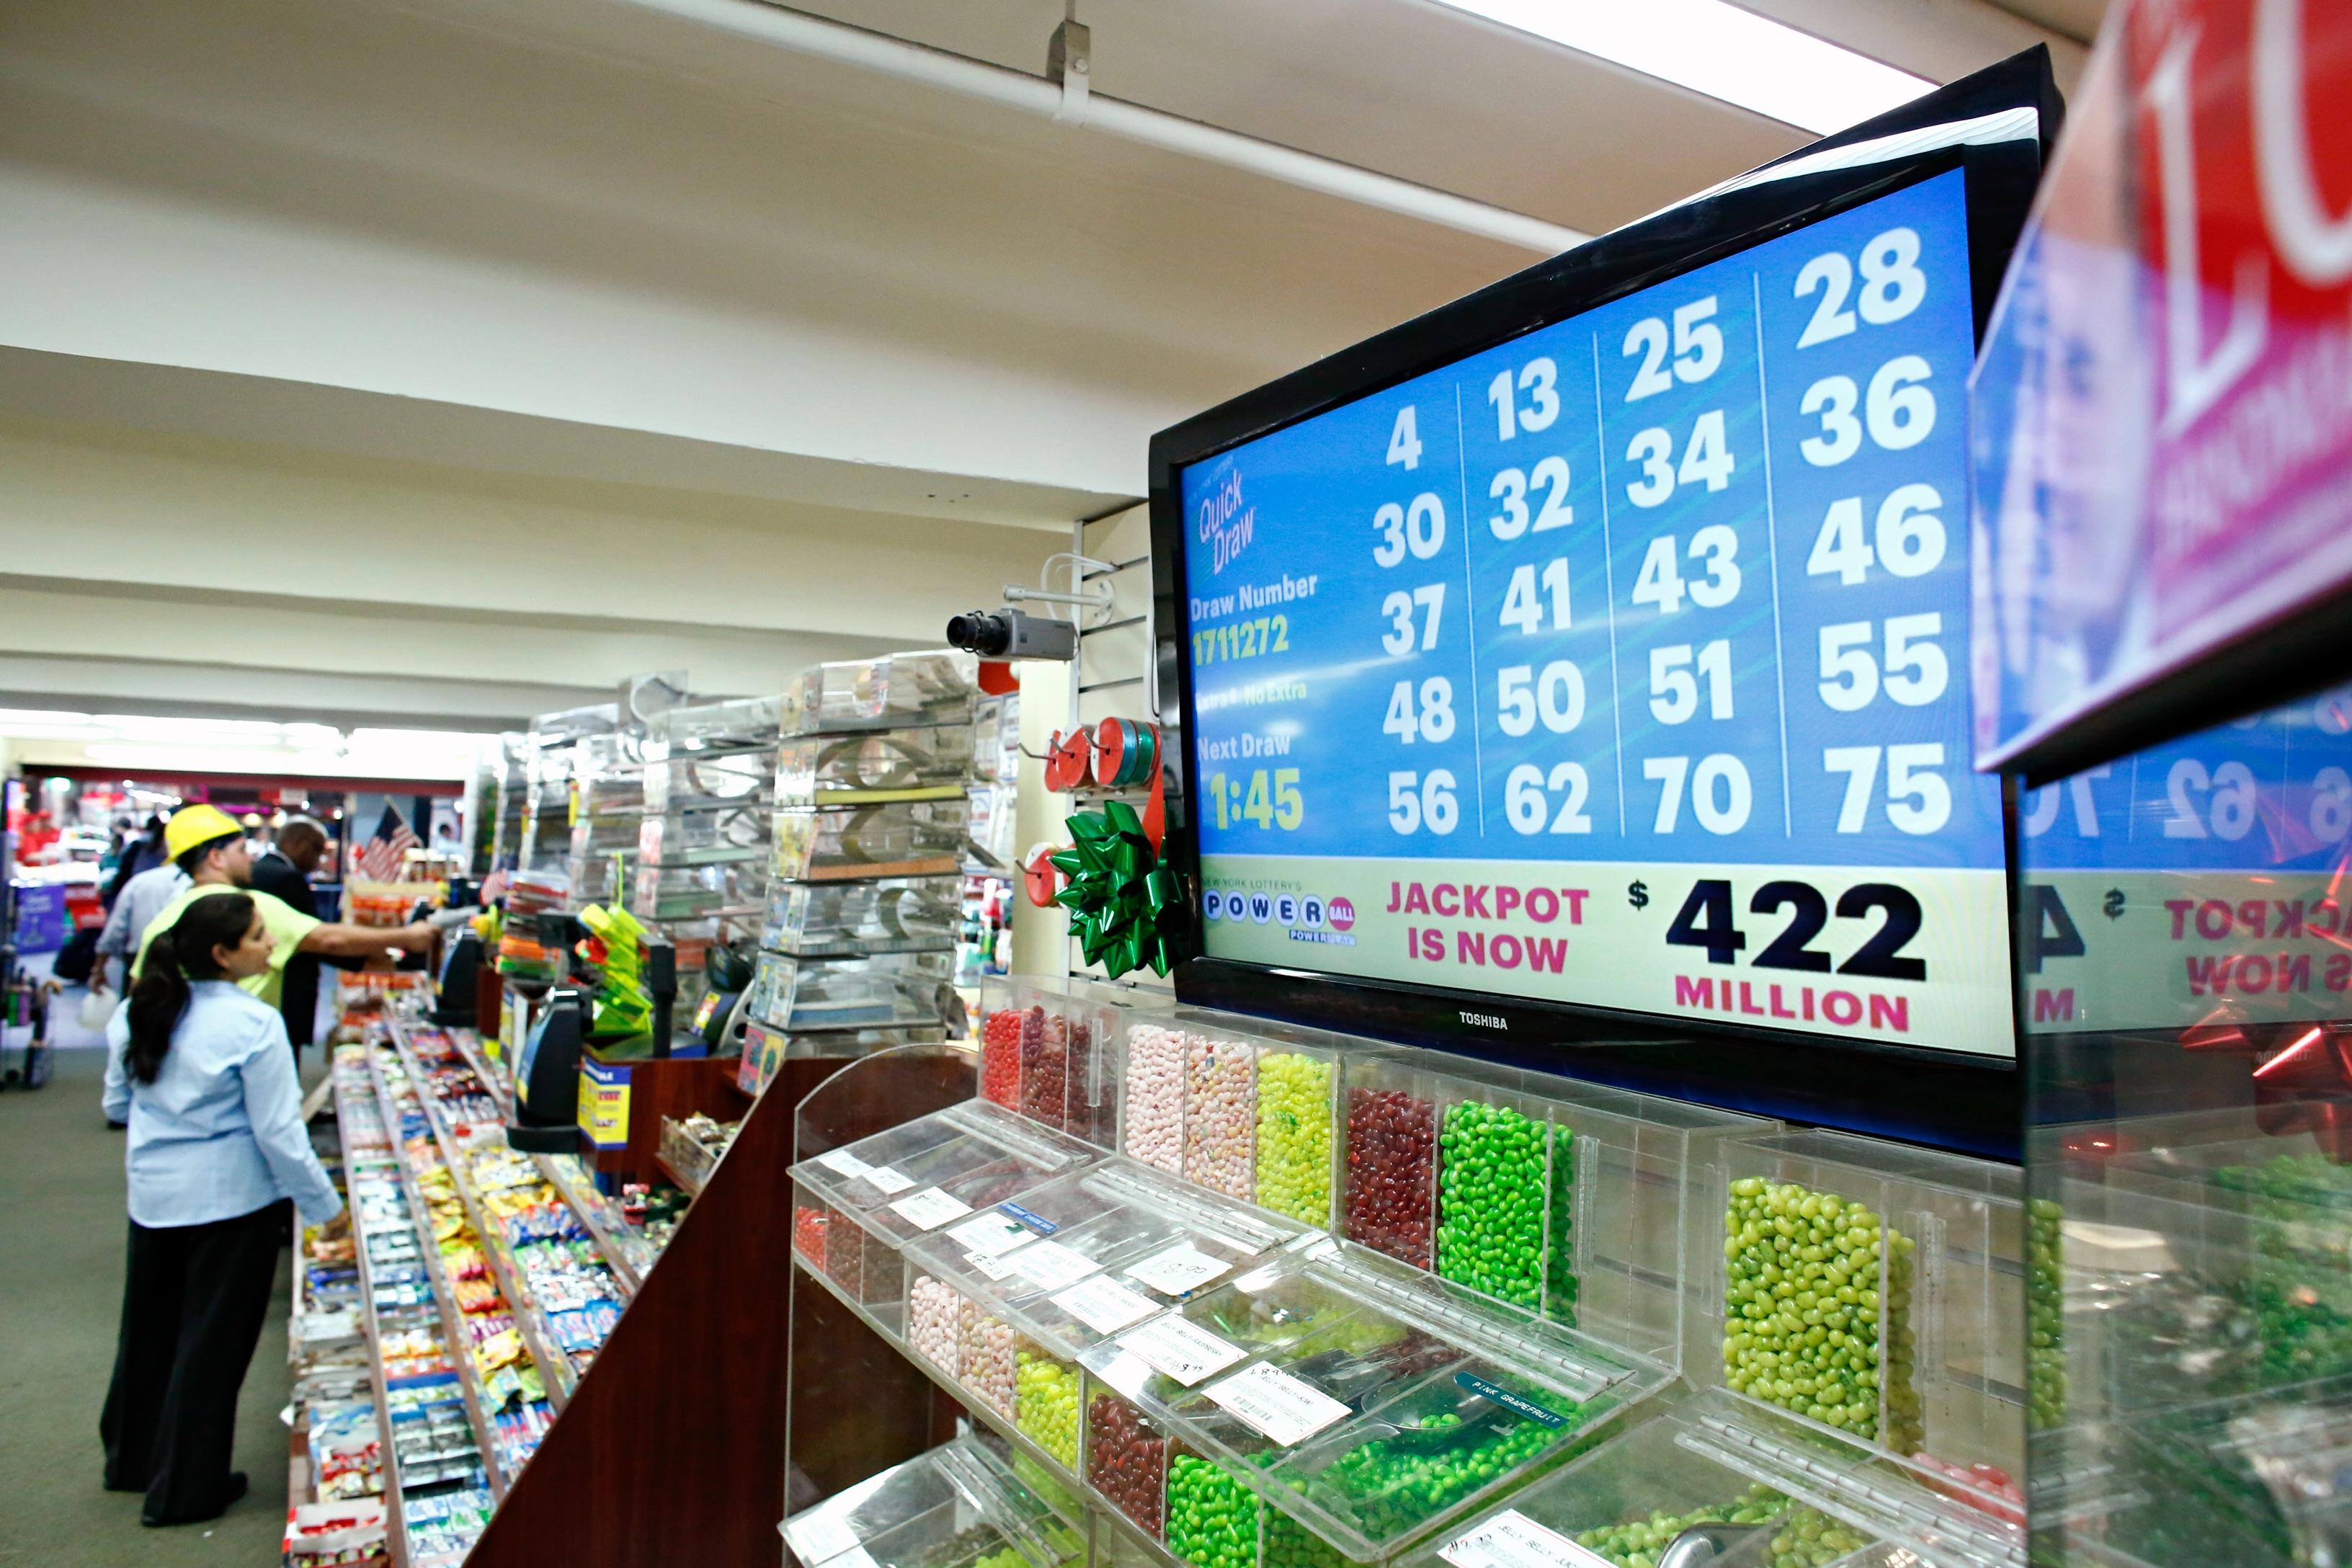 Powerball Lottery Reaches $442 Million